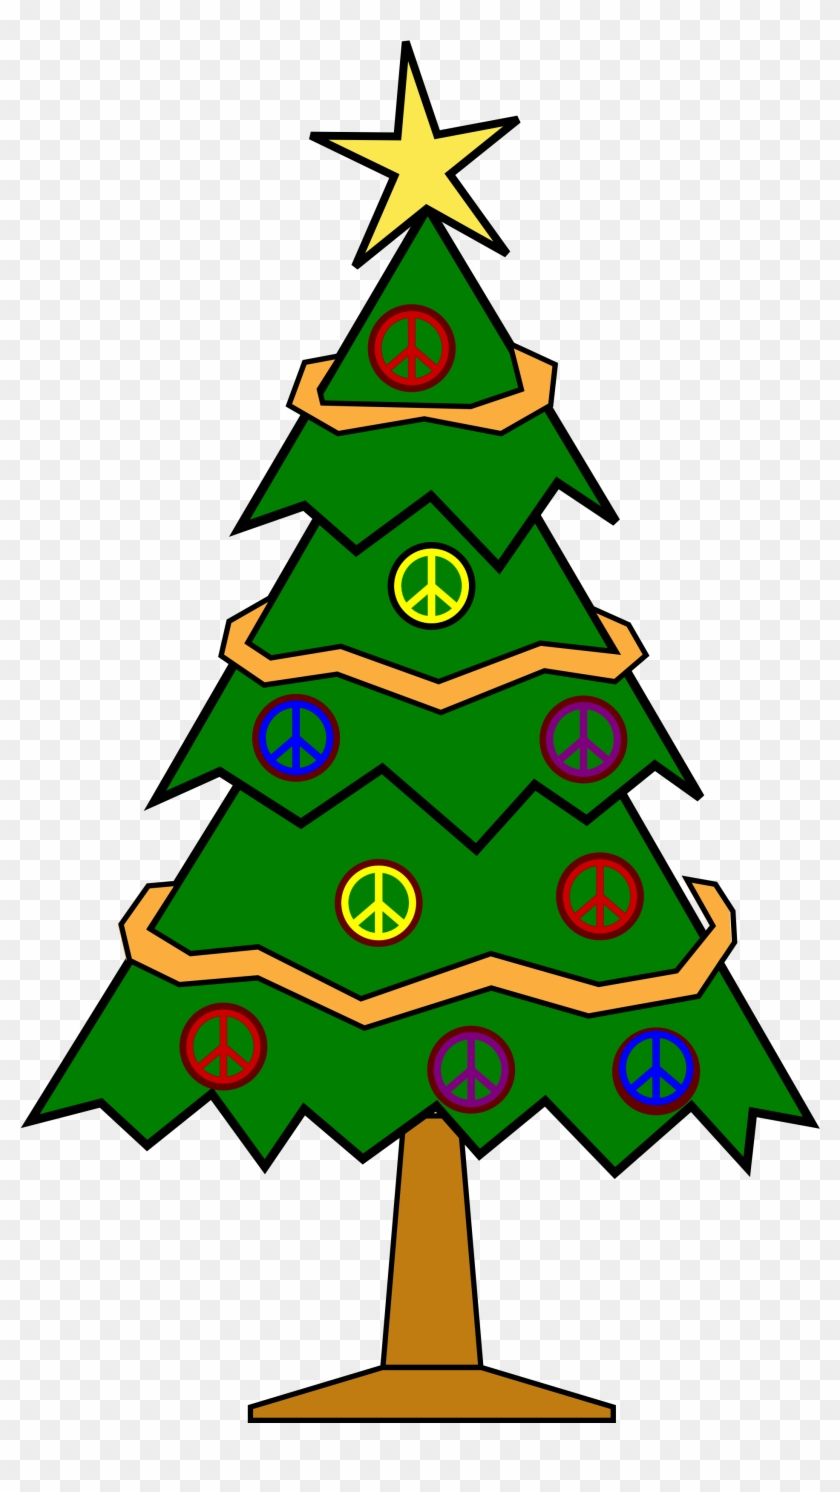 xmas art christmas tree clip art png free transparent png rh clipartmax com evergreen tree clip art silhouette evergreen tree clipart black and white